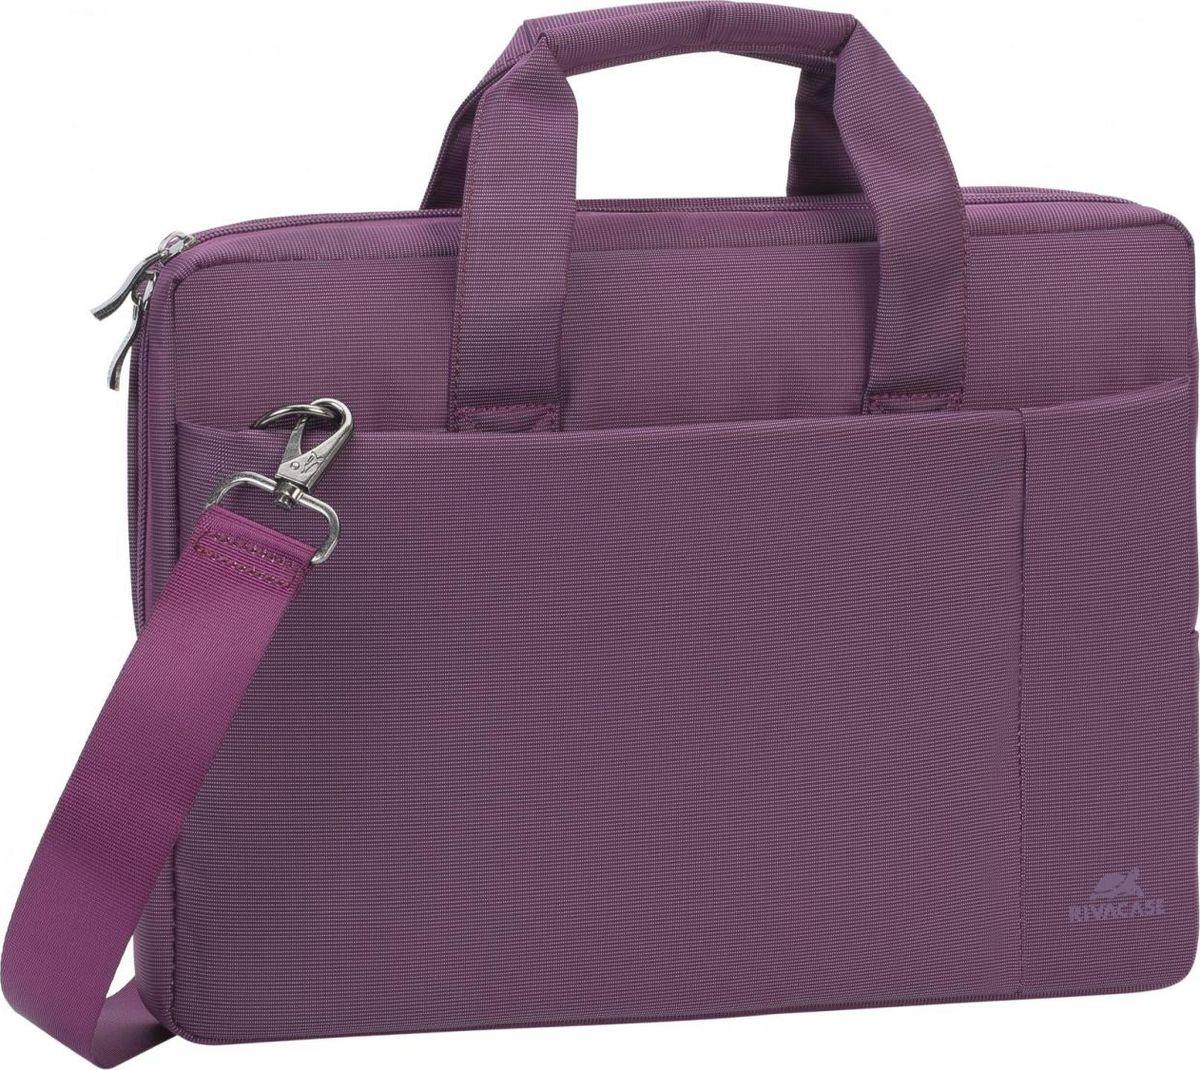 RivaCase 8221, Purple сумка для ноутбука 13,3